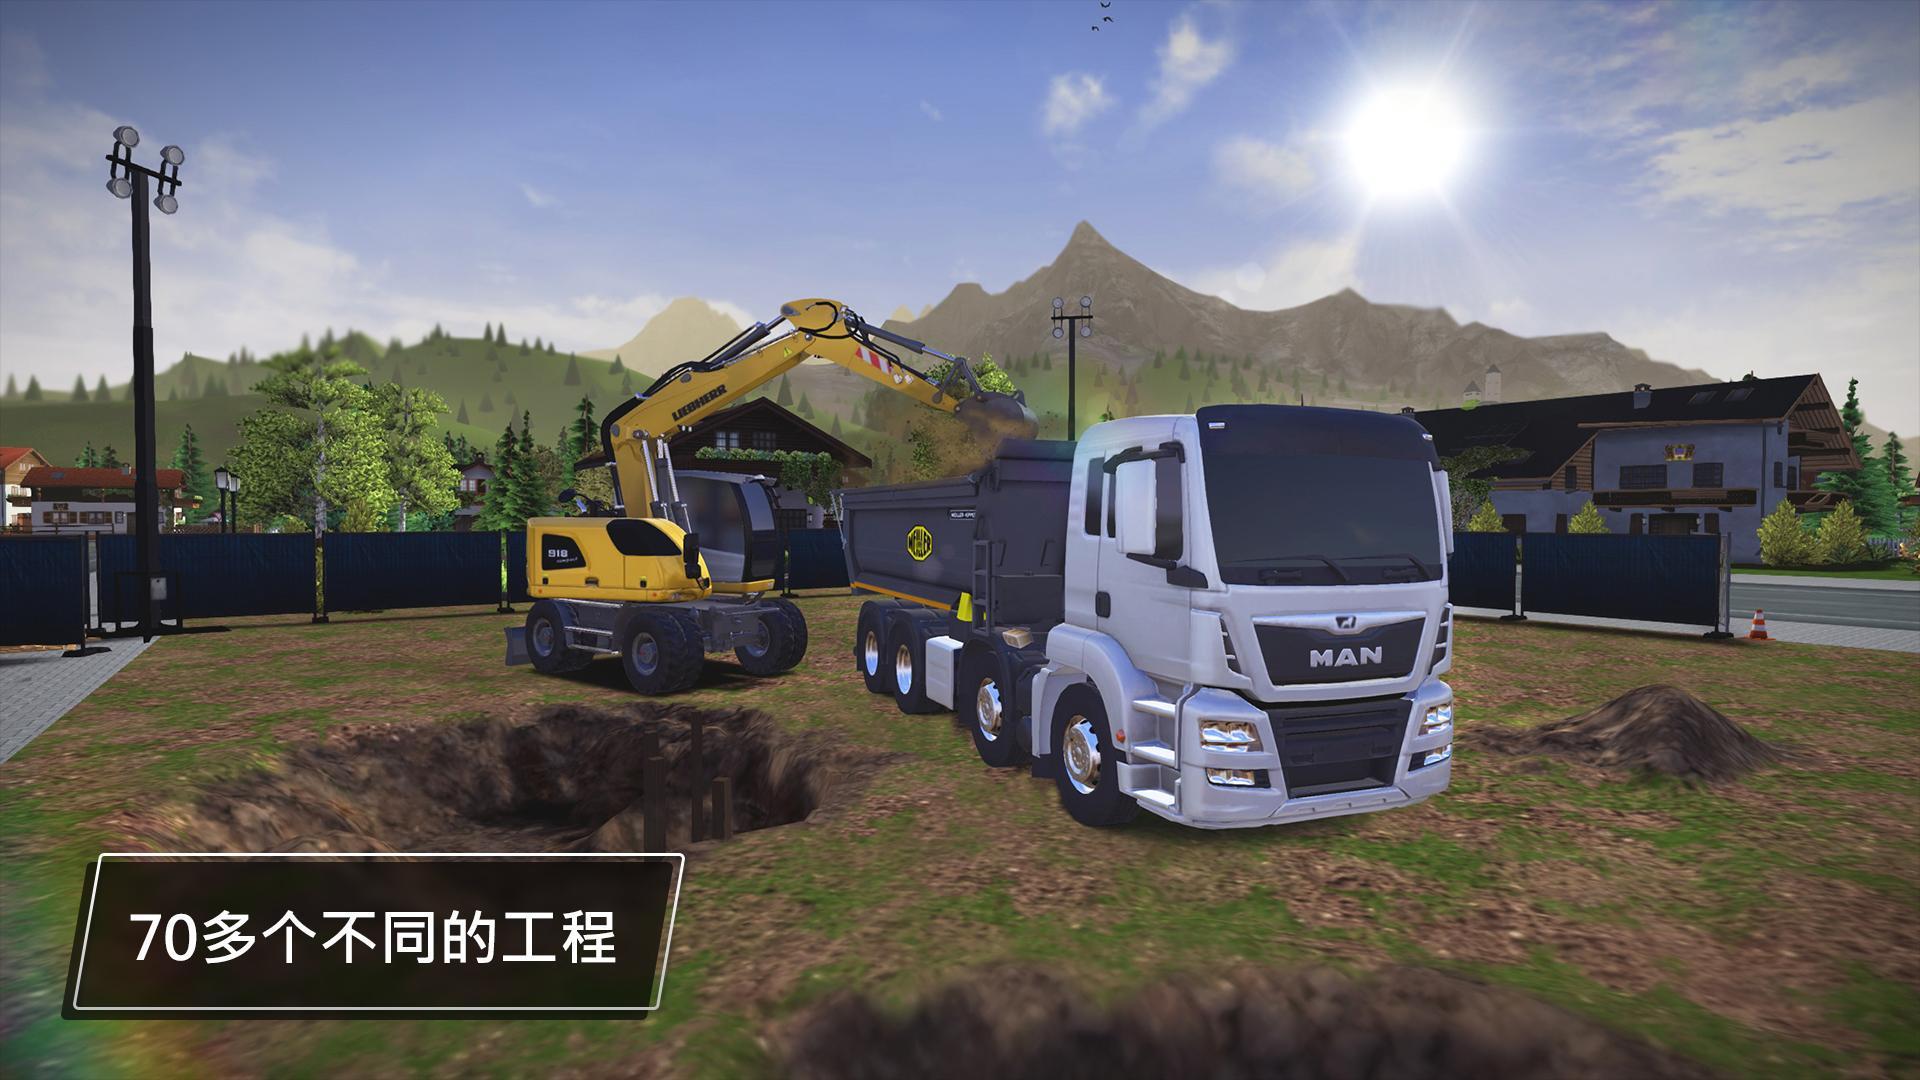 模拟建设 3(Construction Simulator 3) 游戏截图5